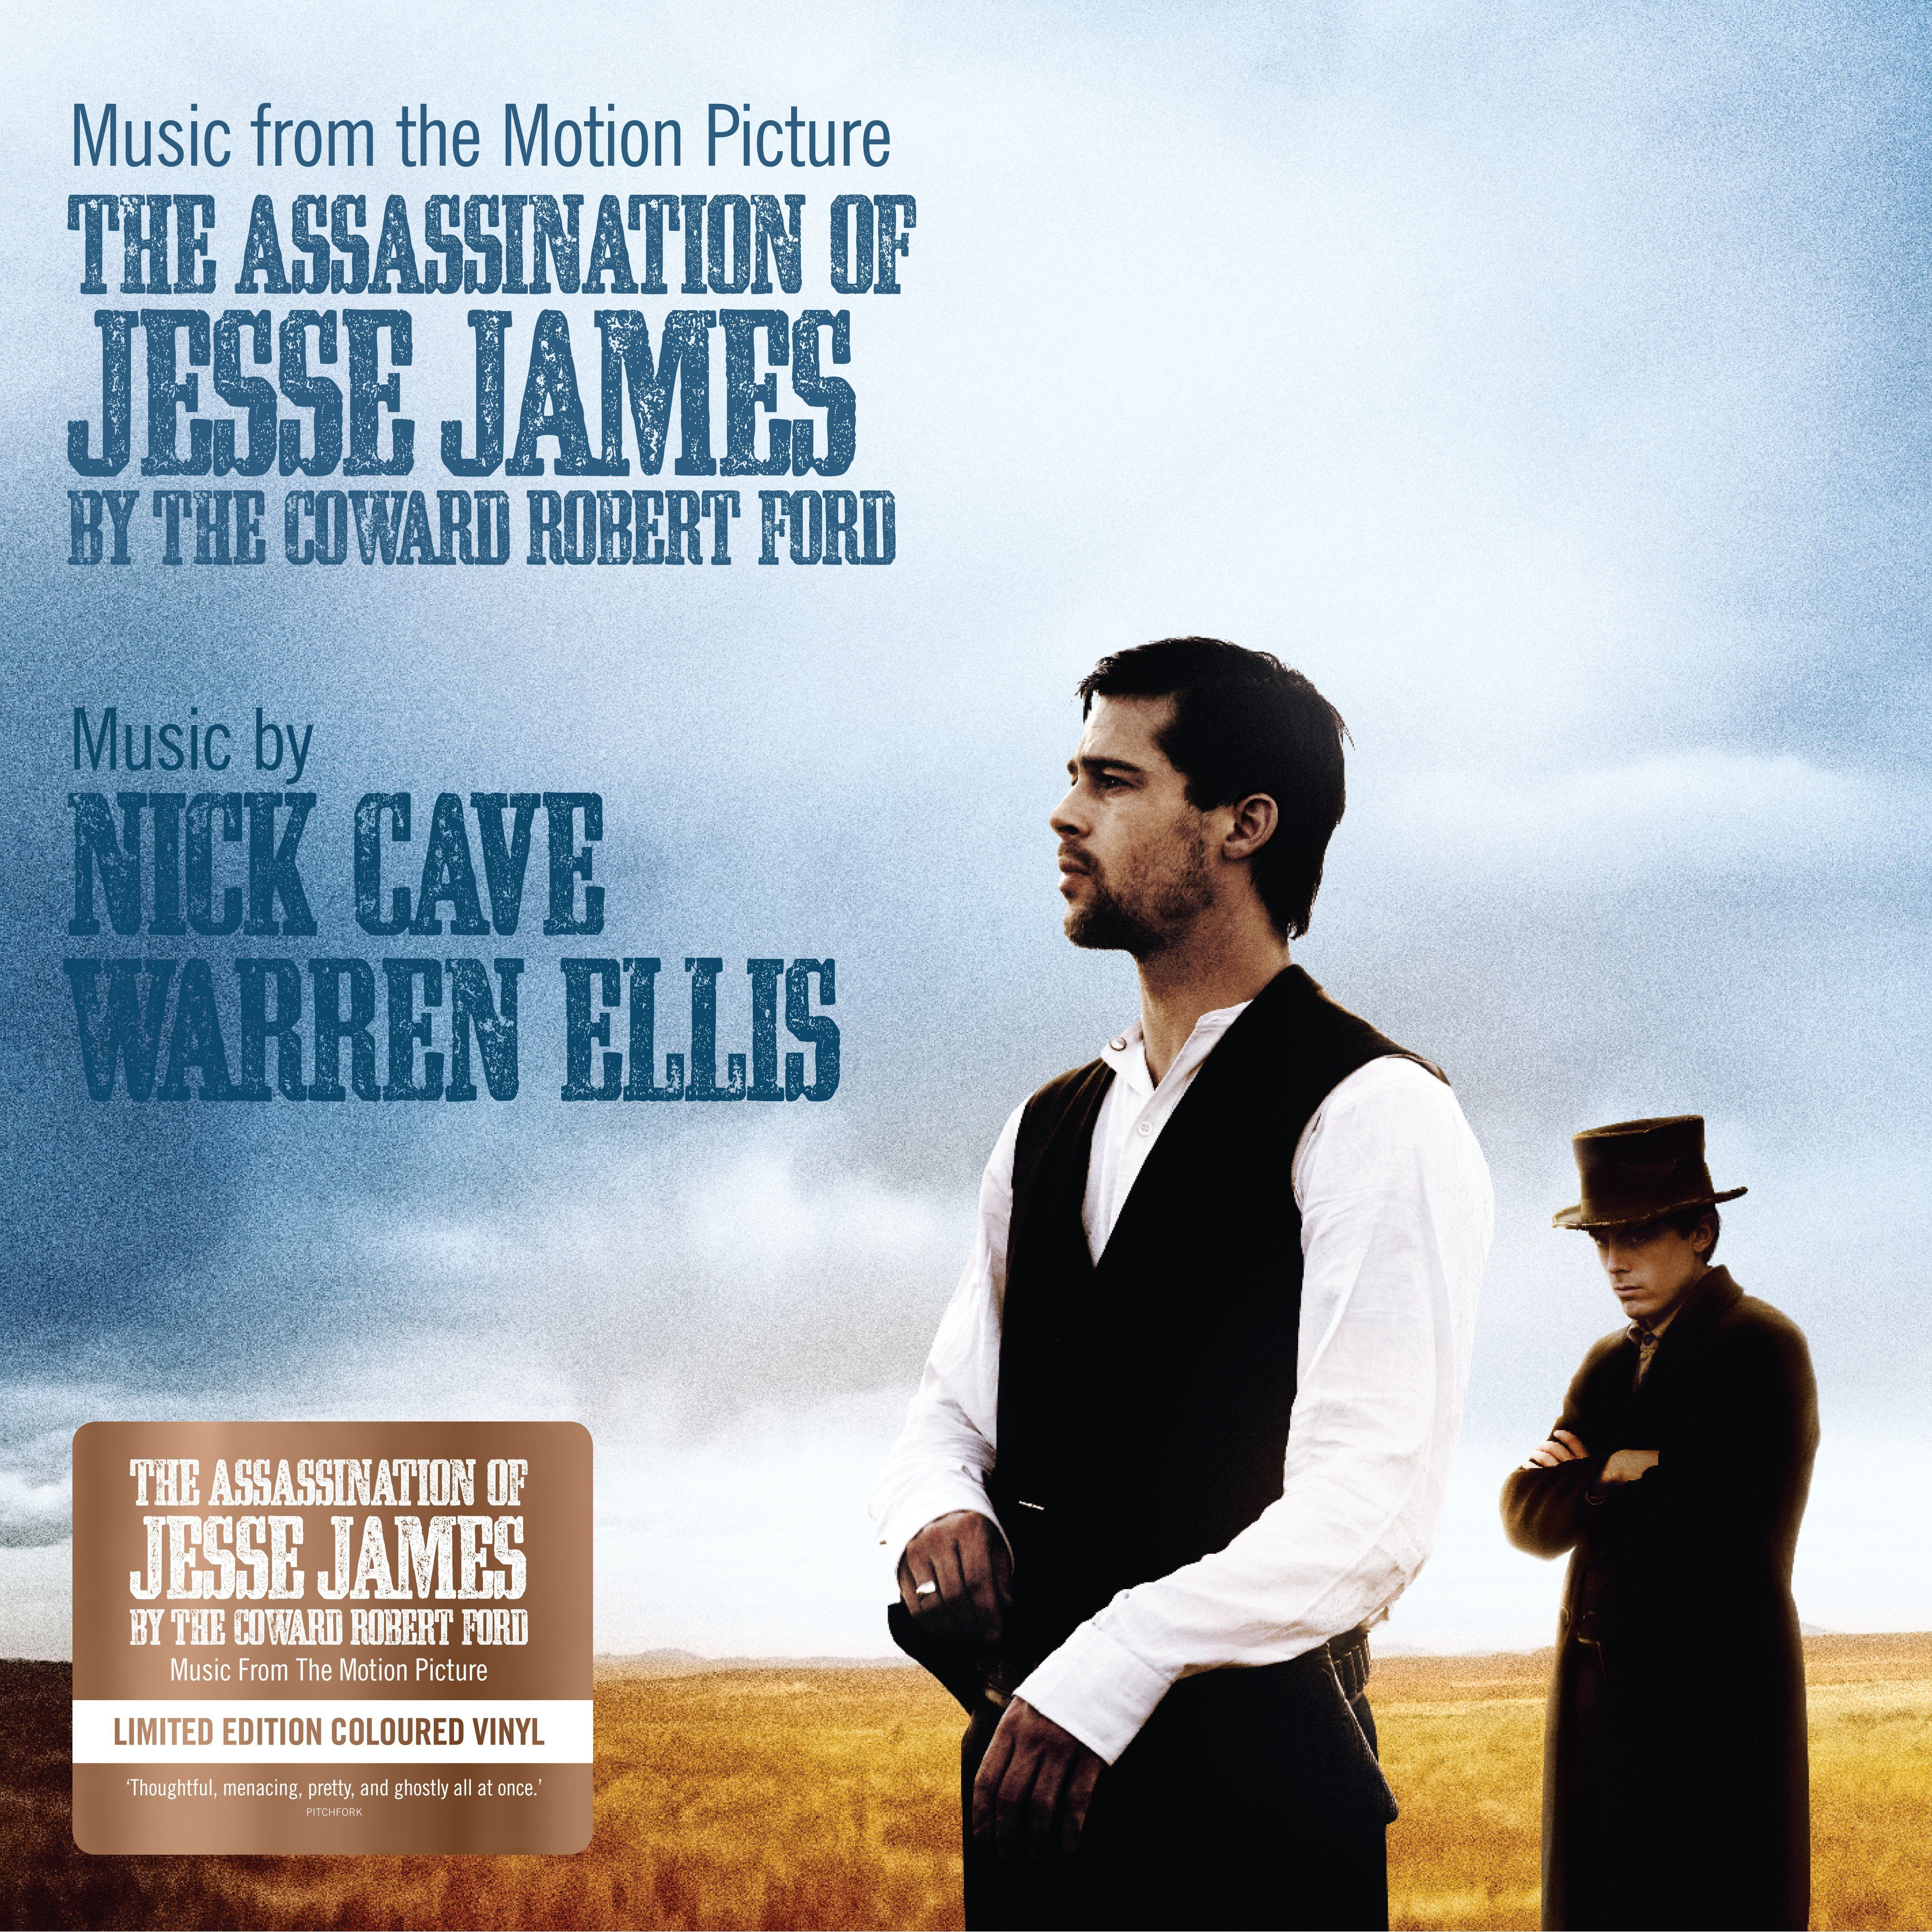 Nick Cave Warren Ellis The Assassination Of Jesse James By The Coward Robert Ford Soundtrack Col Assassination Of Jesse James Jesse James Movie Soundtracks